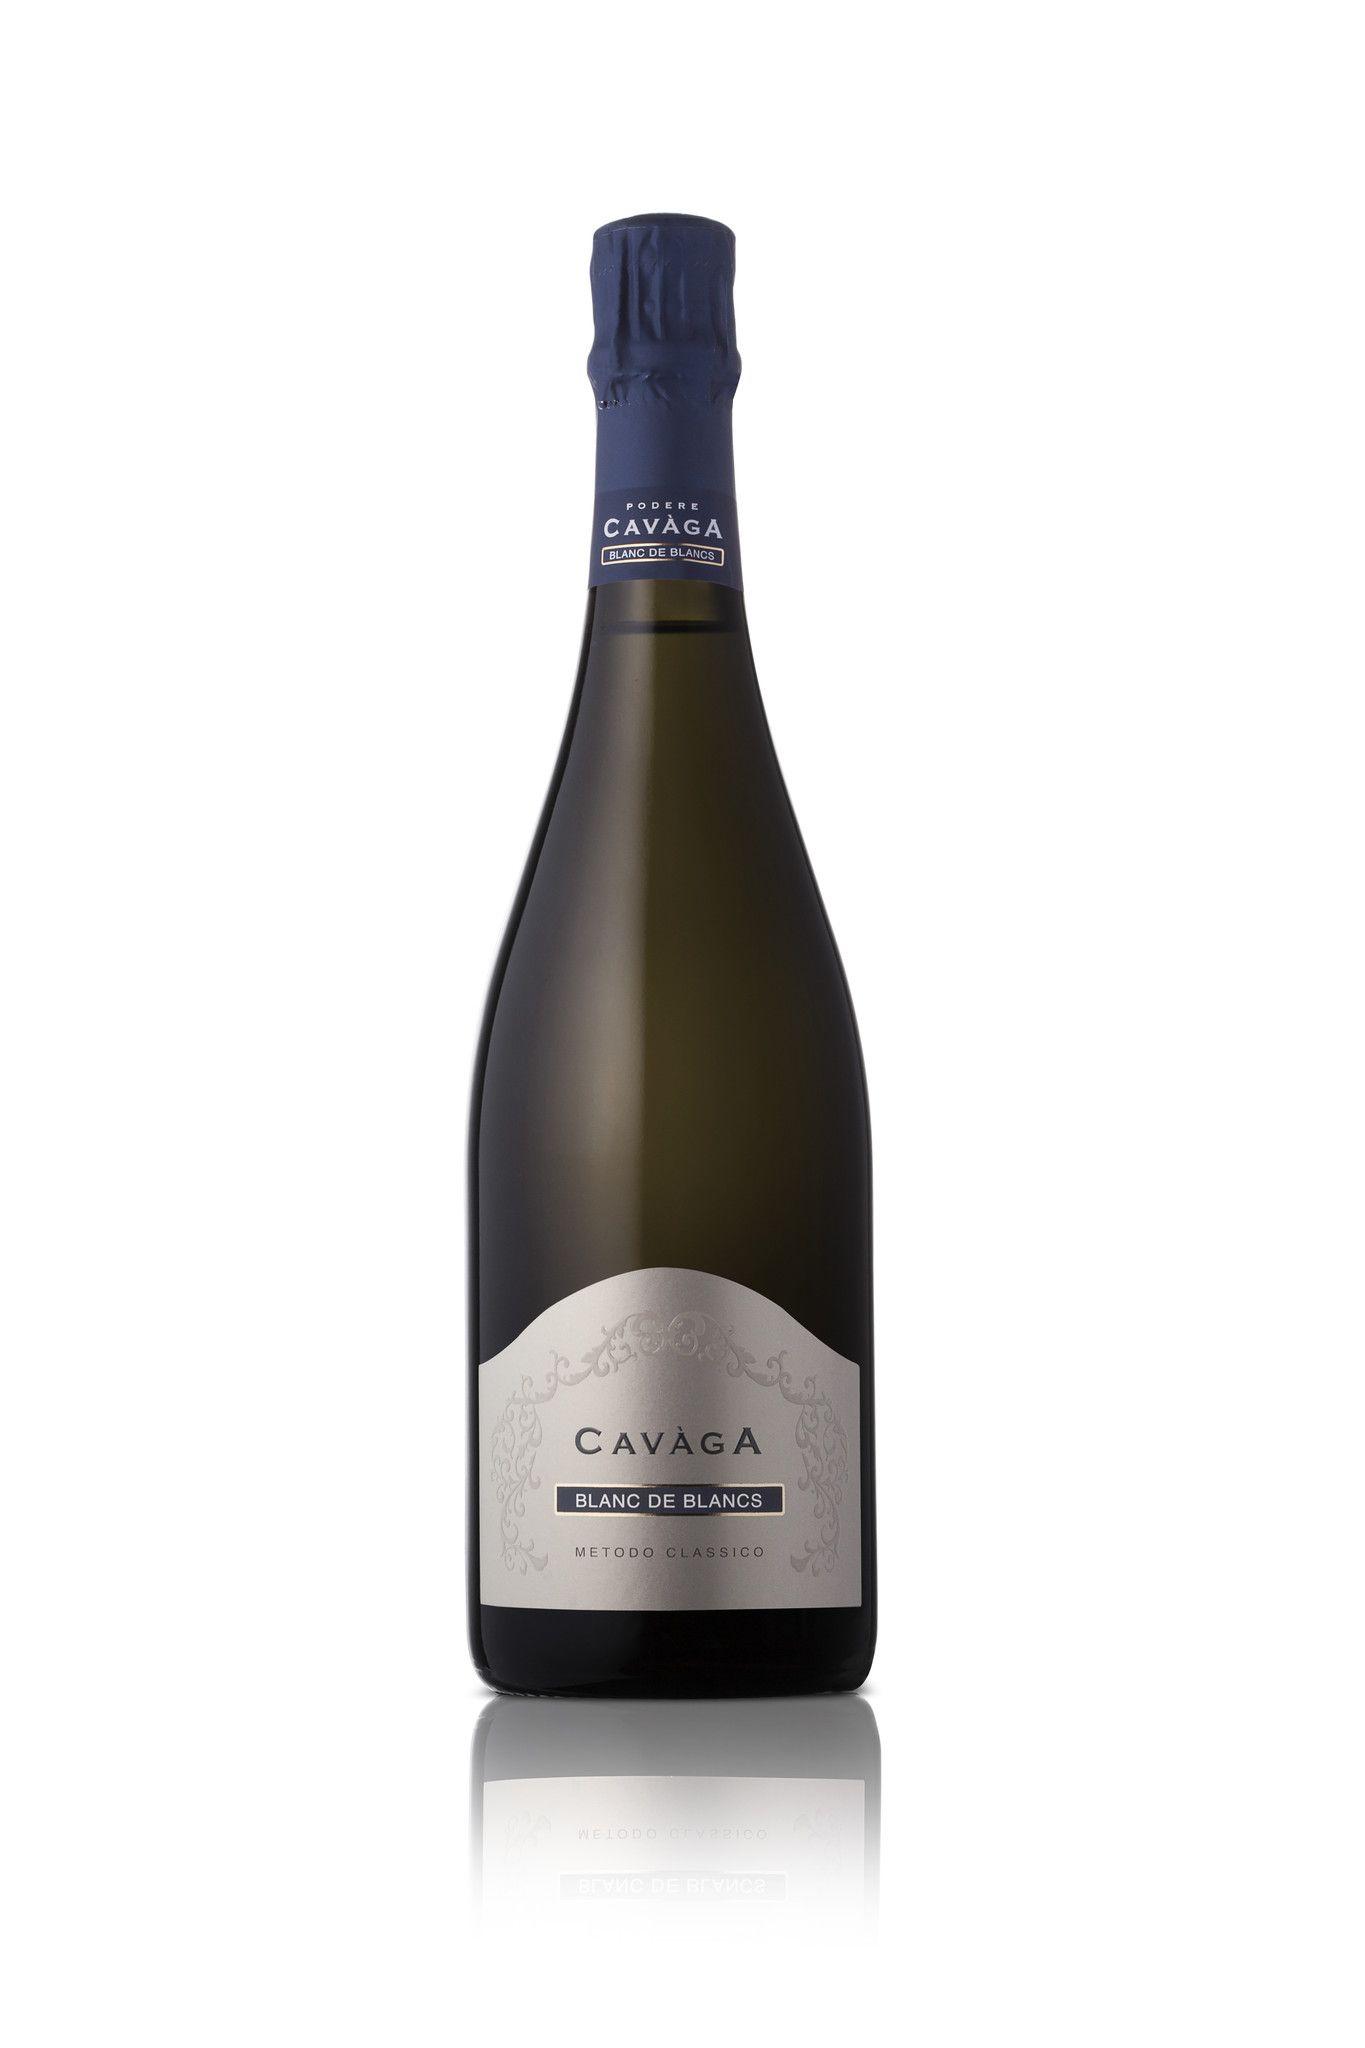 Spumante Bollicine Blanc de Blancs Magnum Metodo Classico Cavaga 2012 1,5 lt